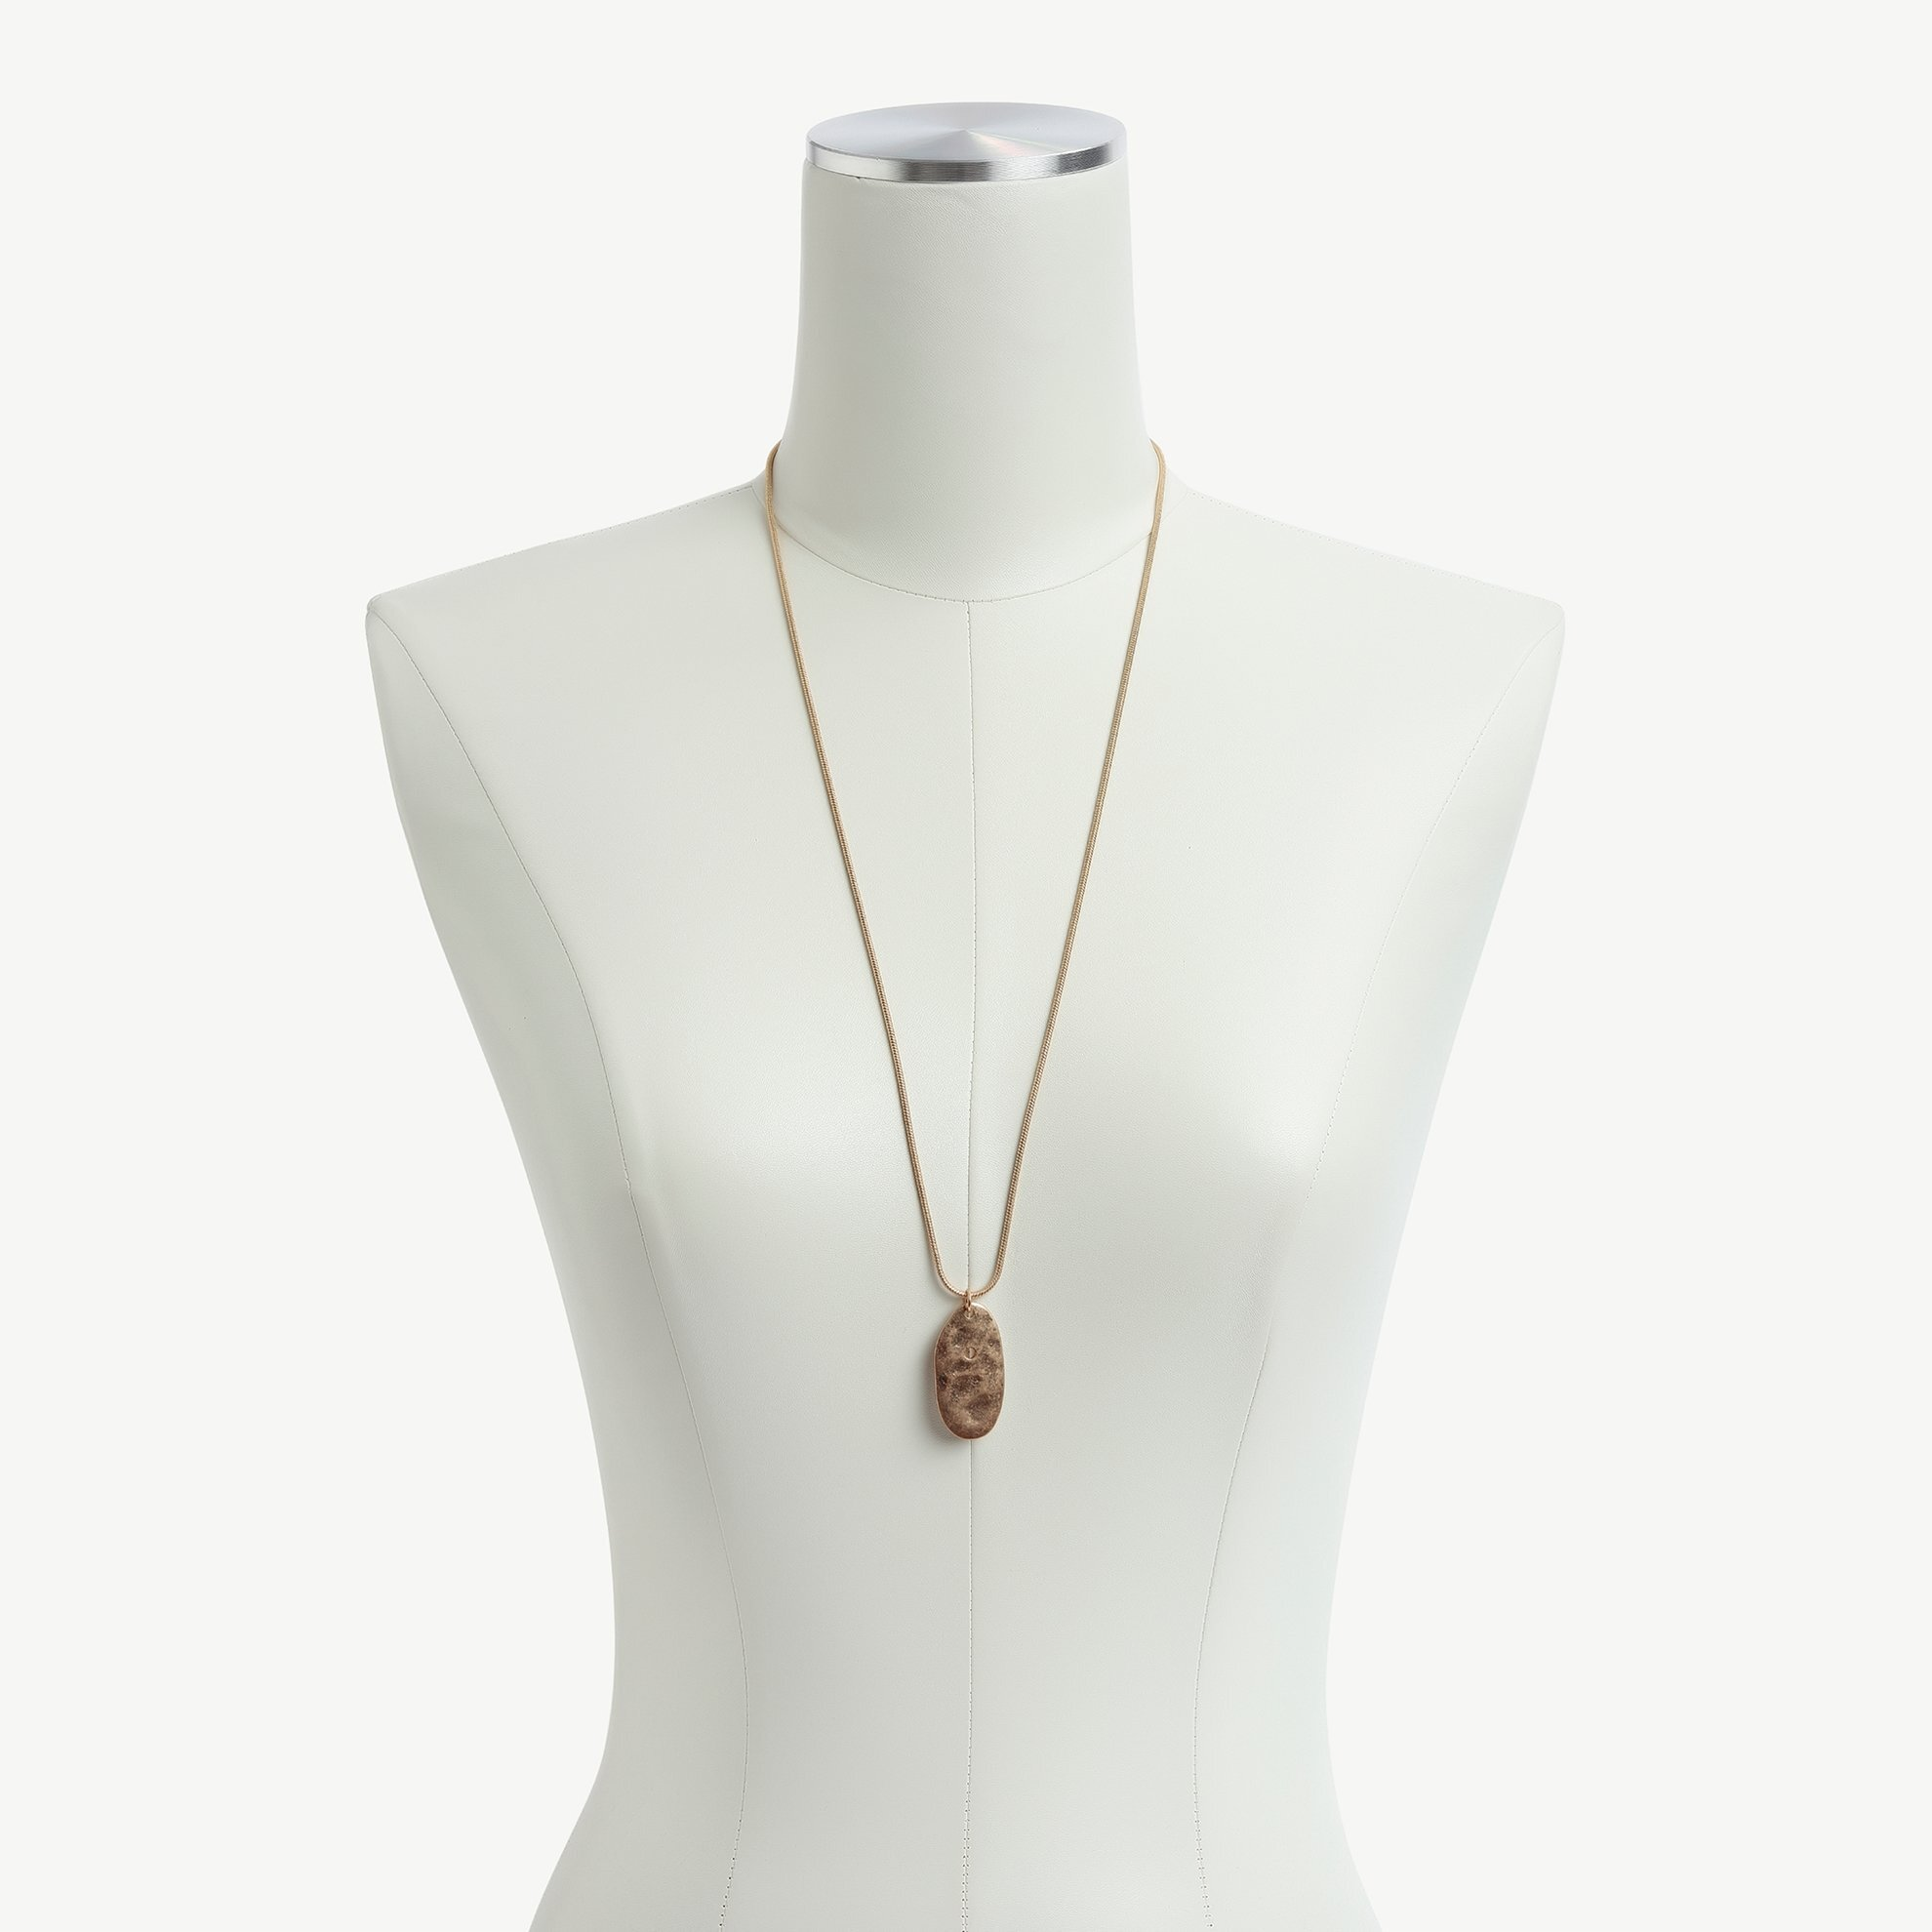 Halskette lang mit rechteckigem Anhänger